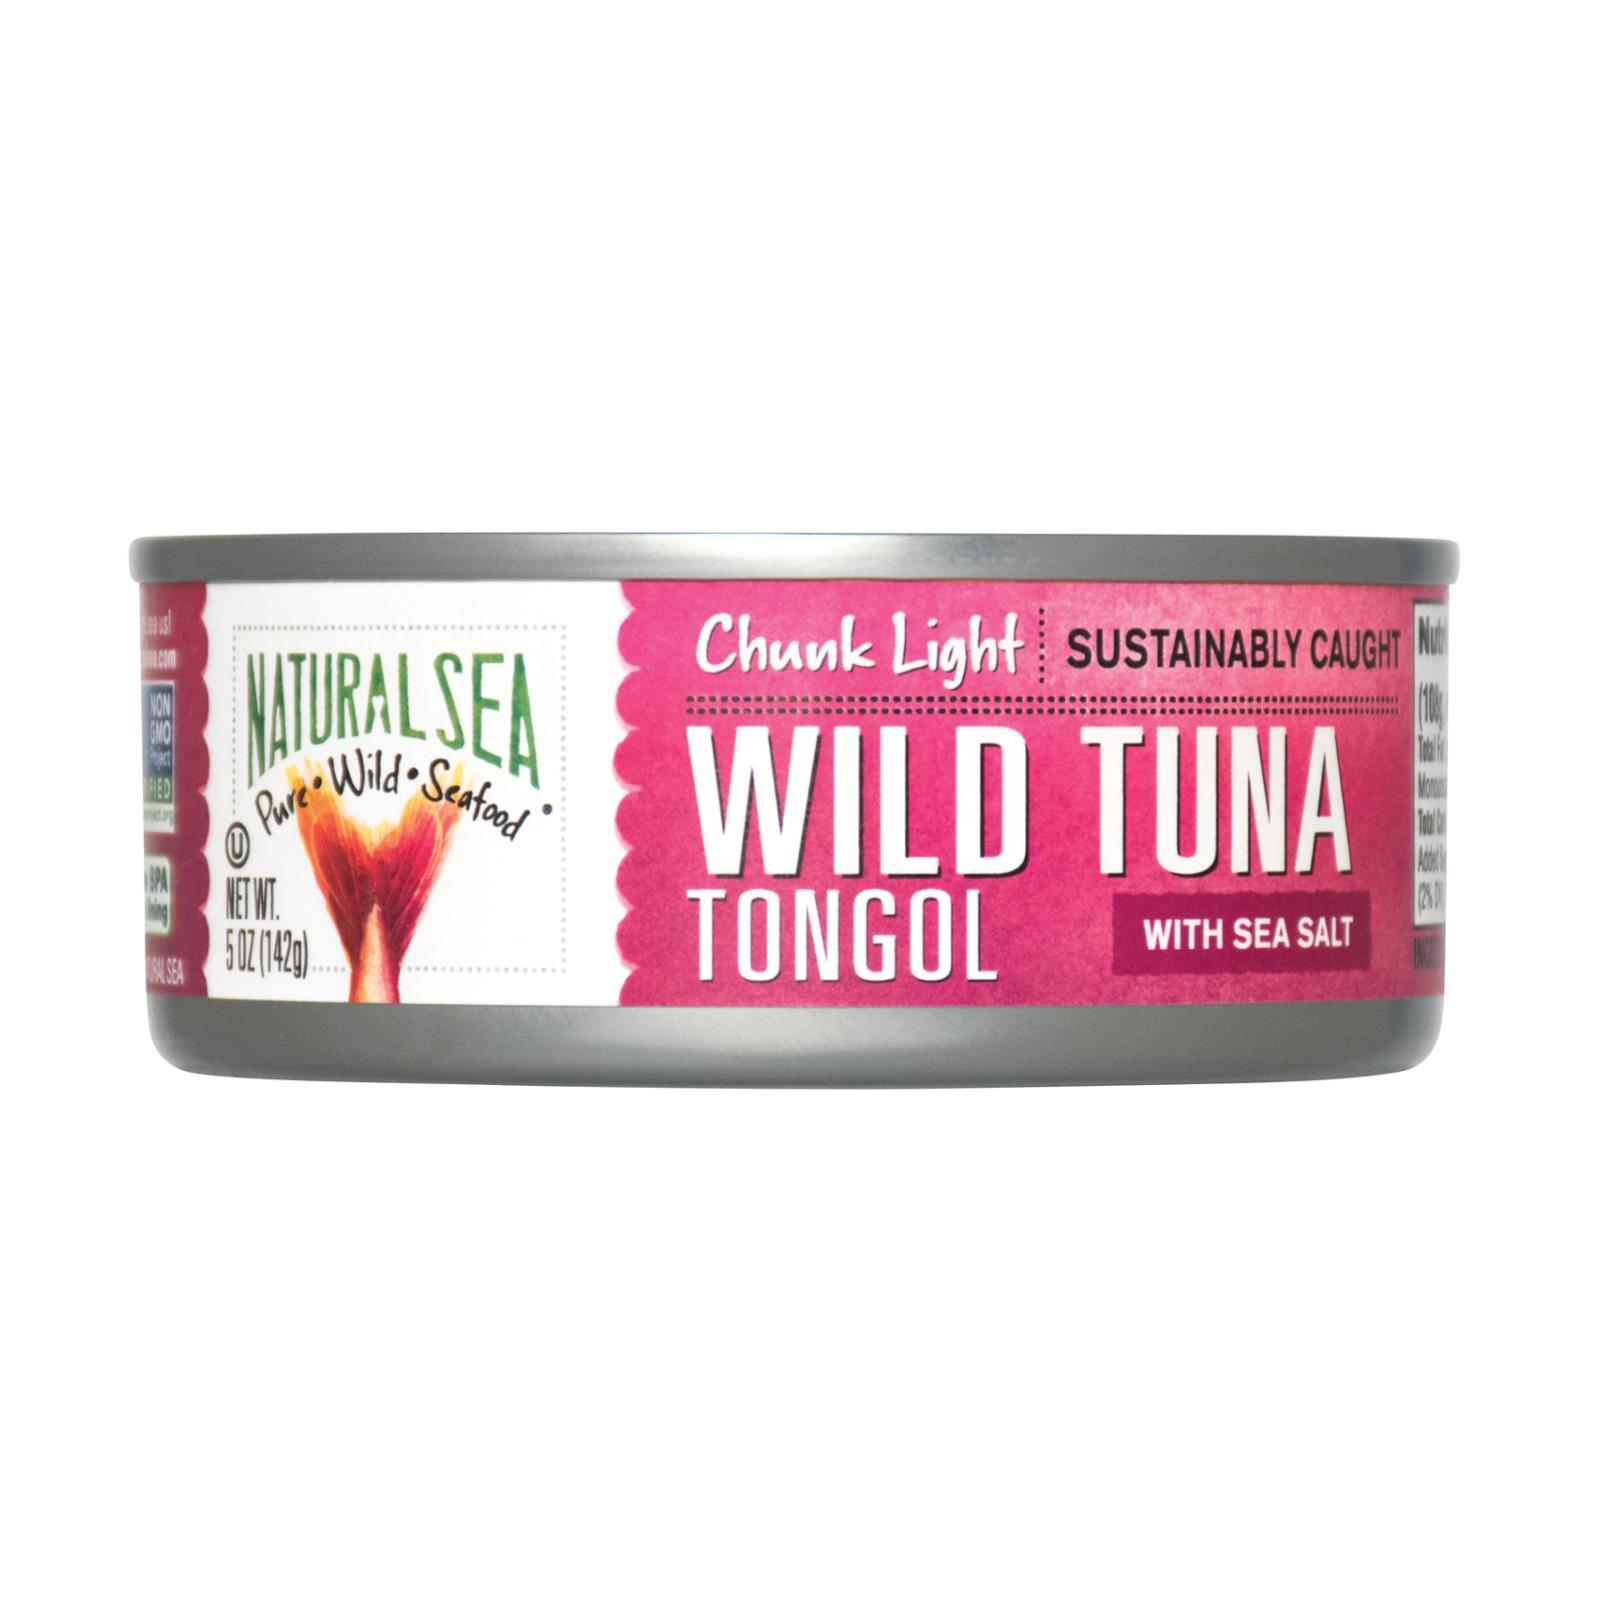 Natural Sea Wild Tongol Tuna - With Sea Salt - Case of 12 -  5 oz.